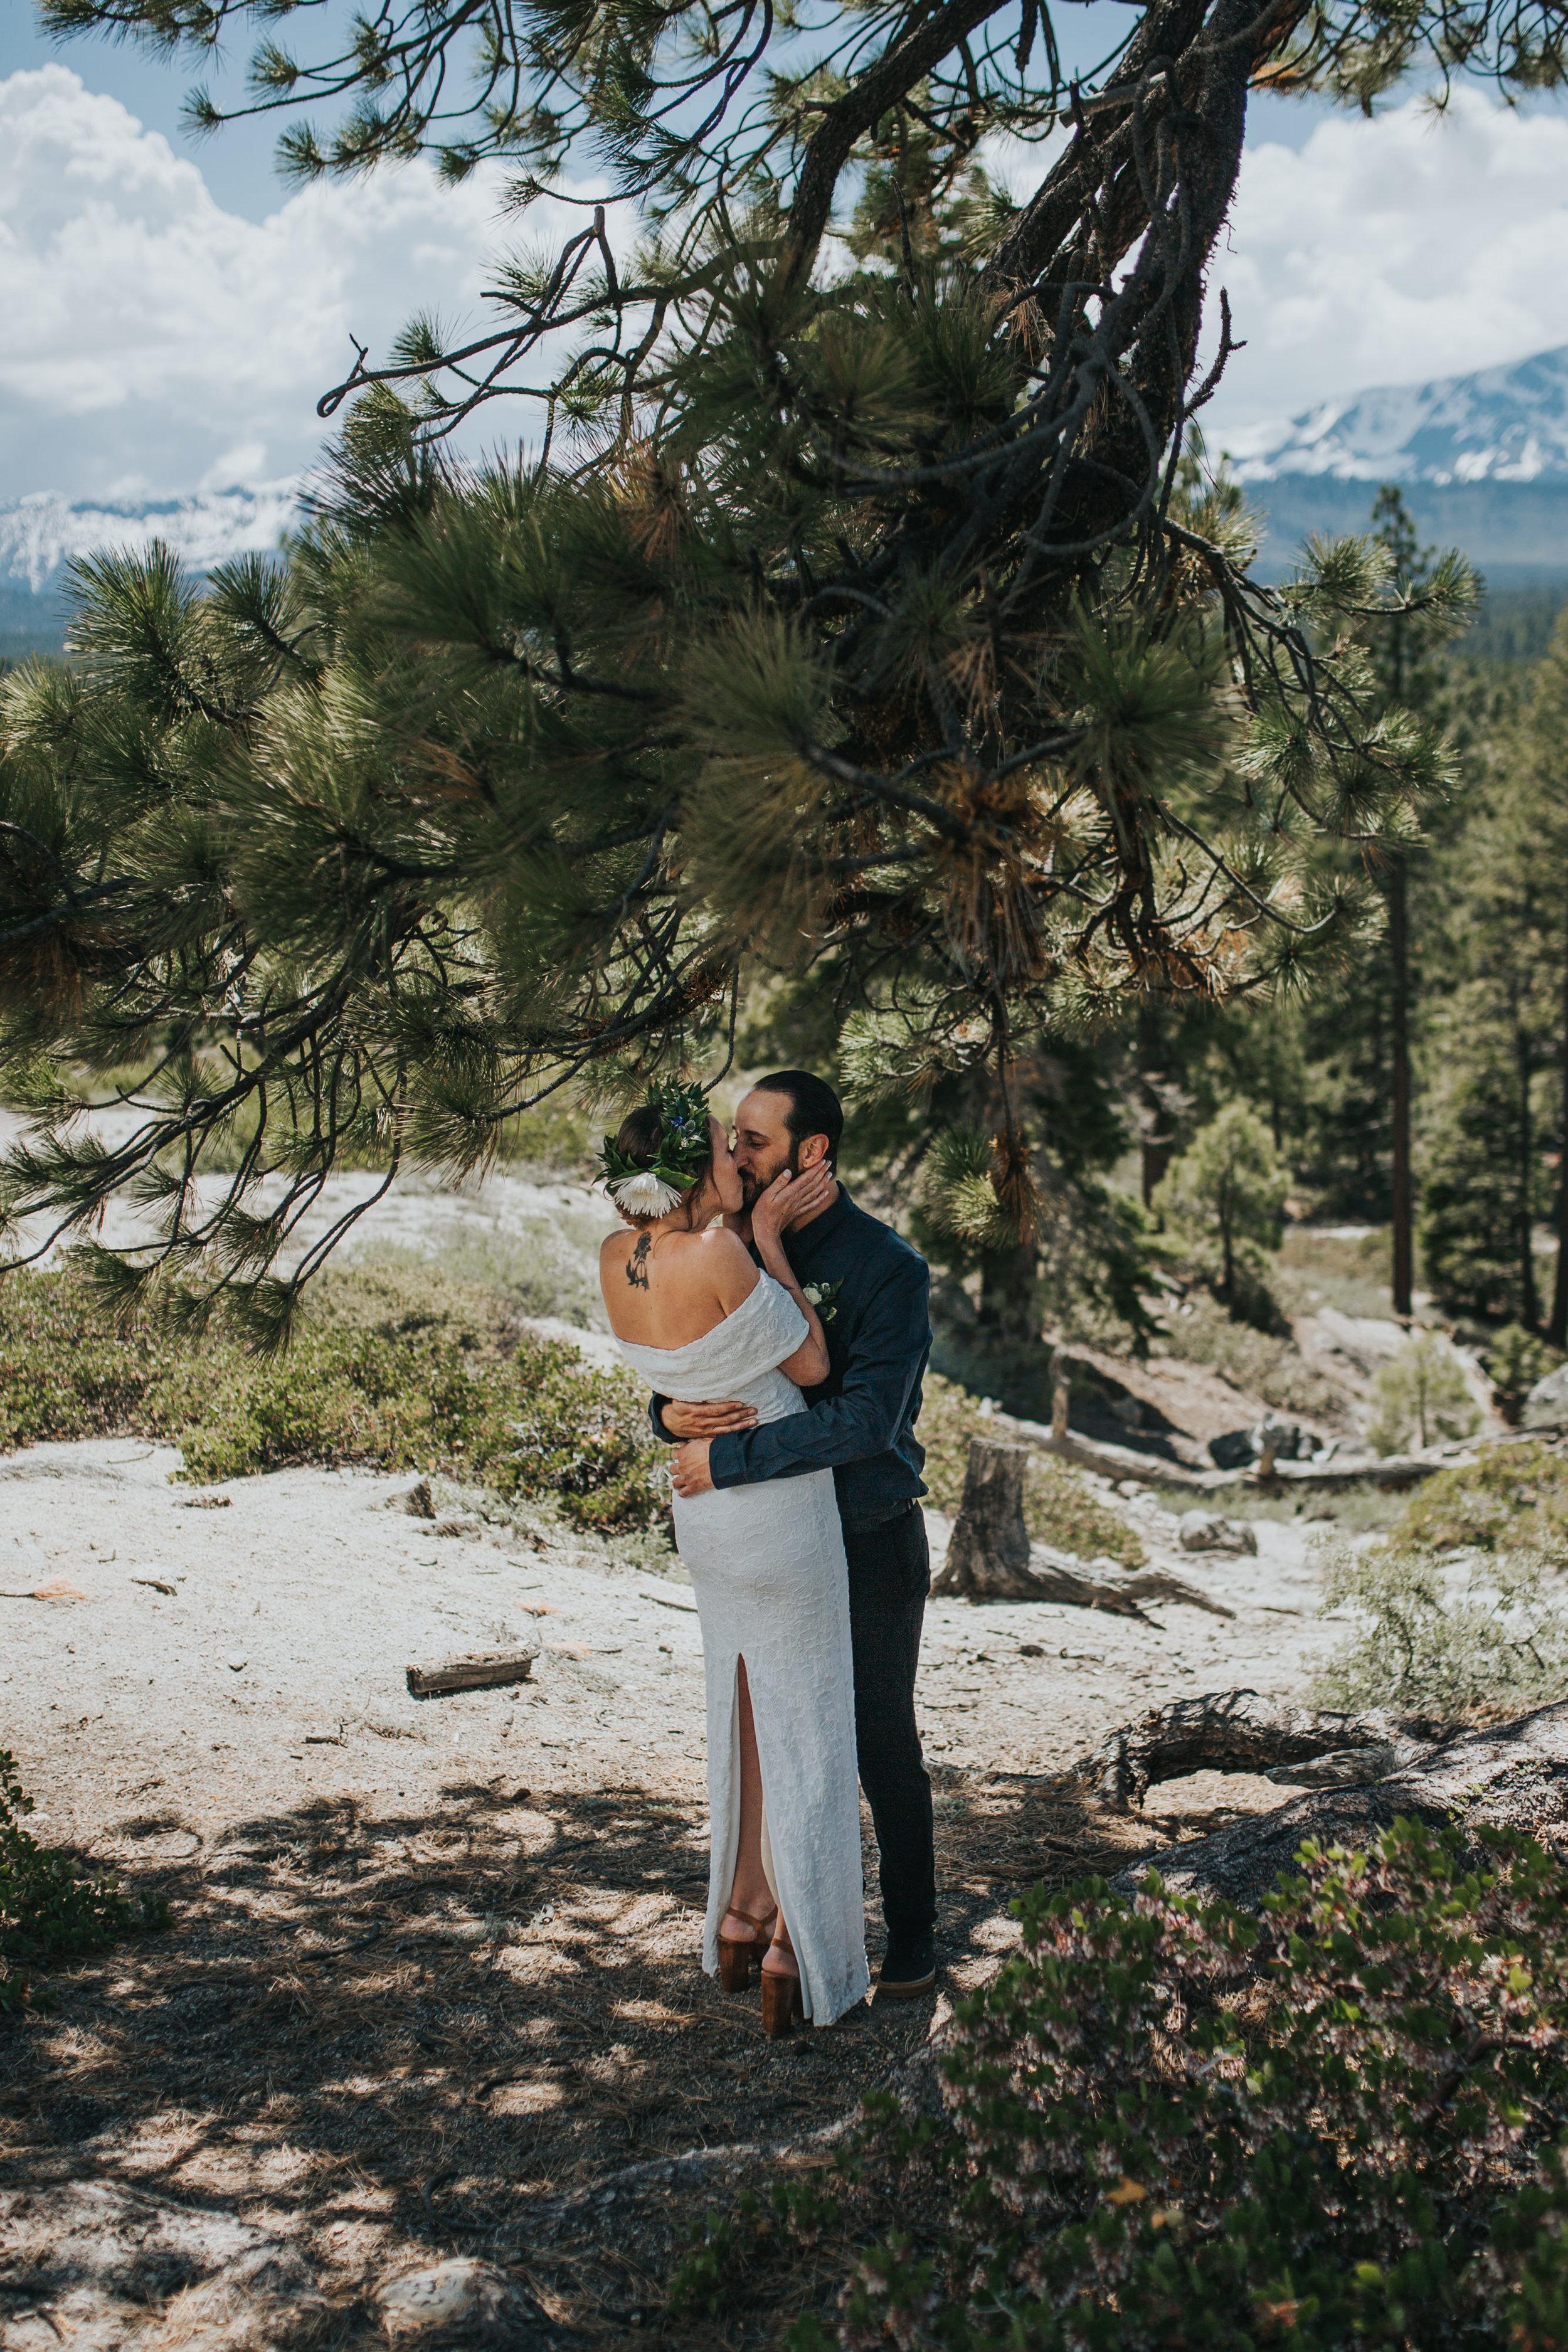 south-lake-tahoe-elopement-valerie-lendvay-photo-013.jpg